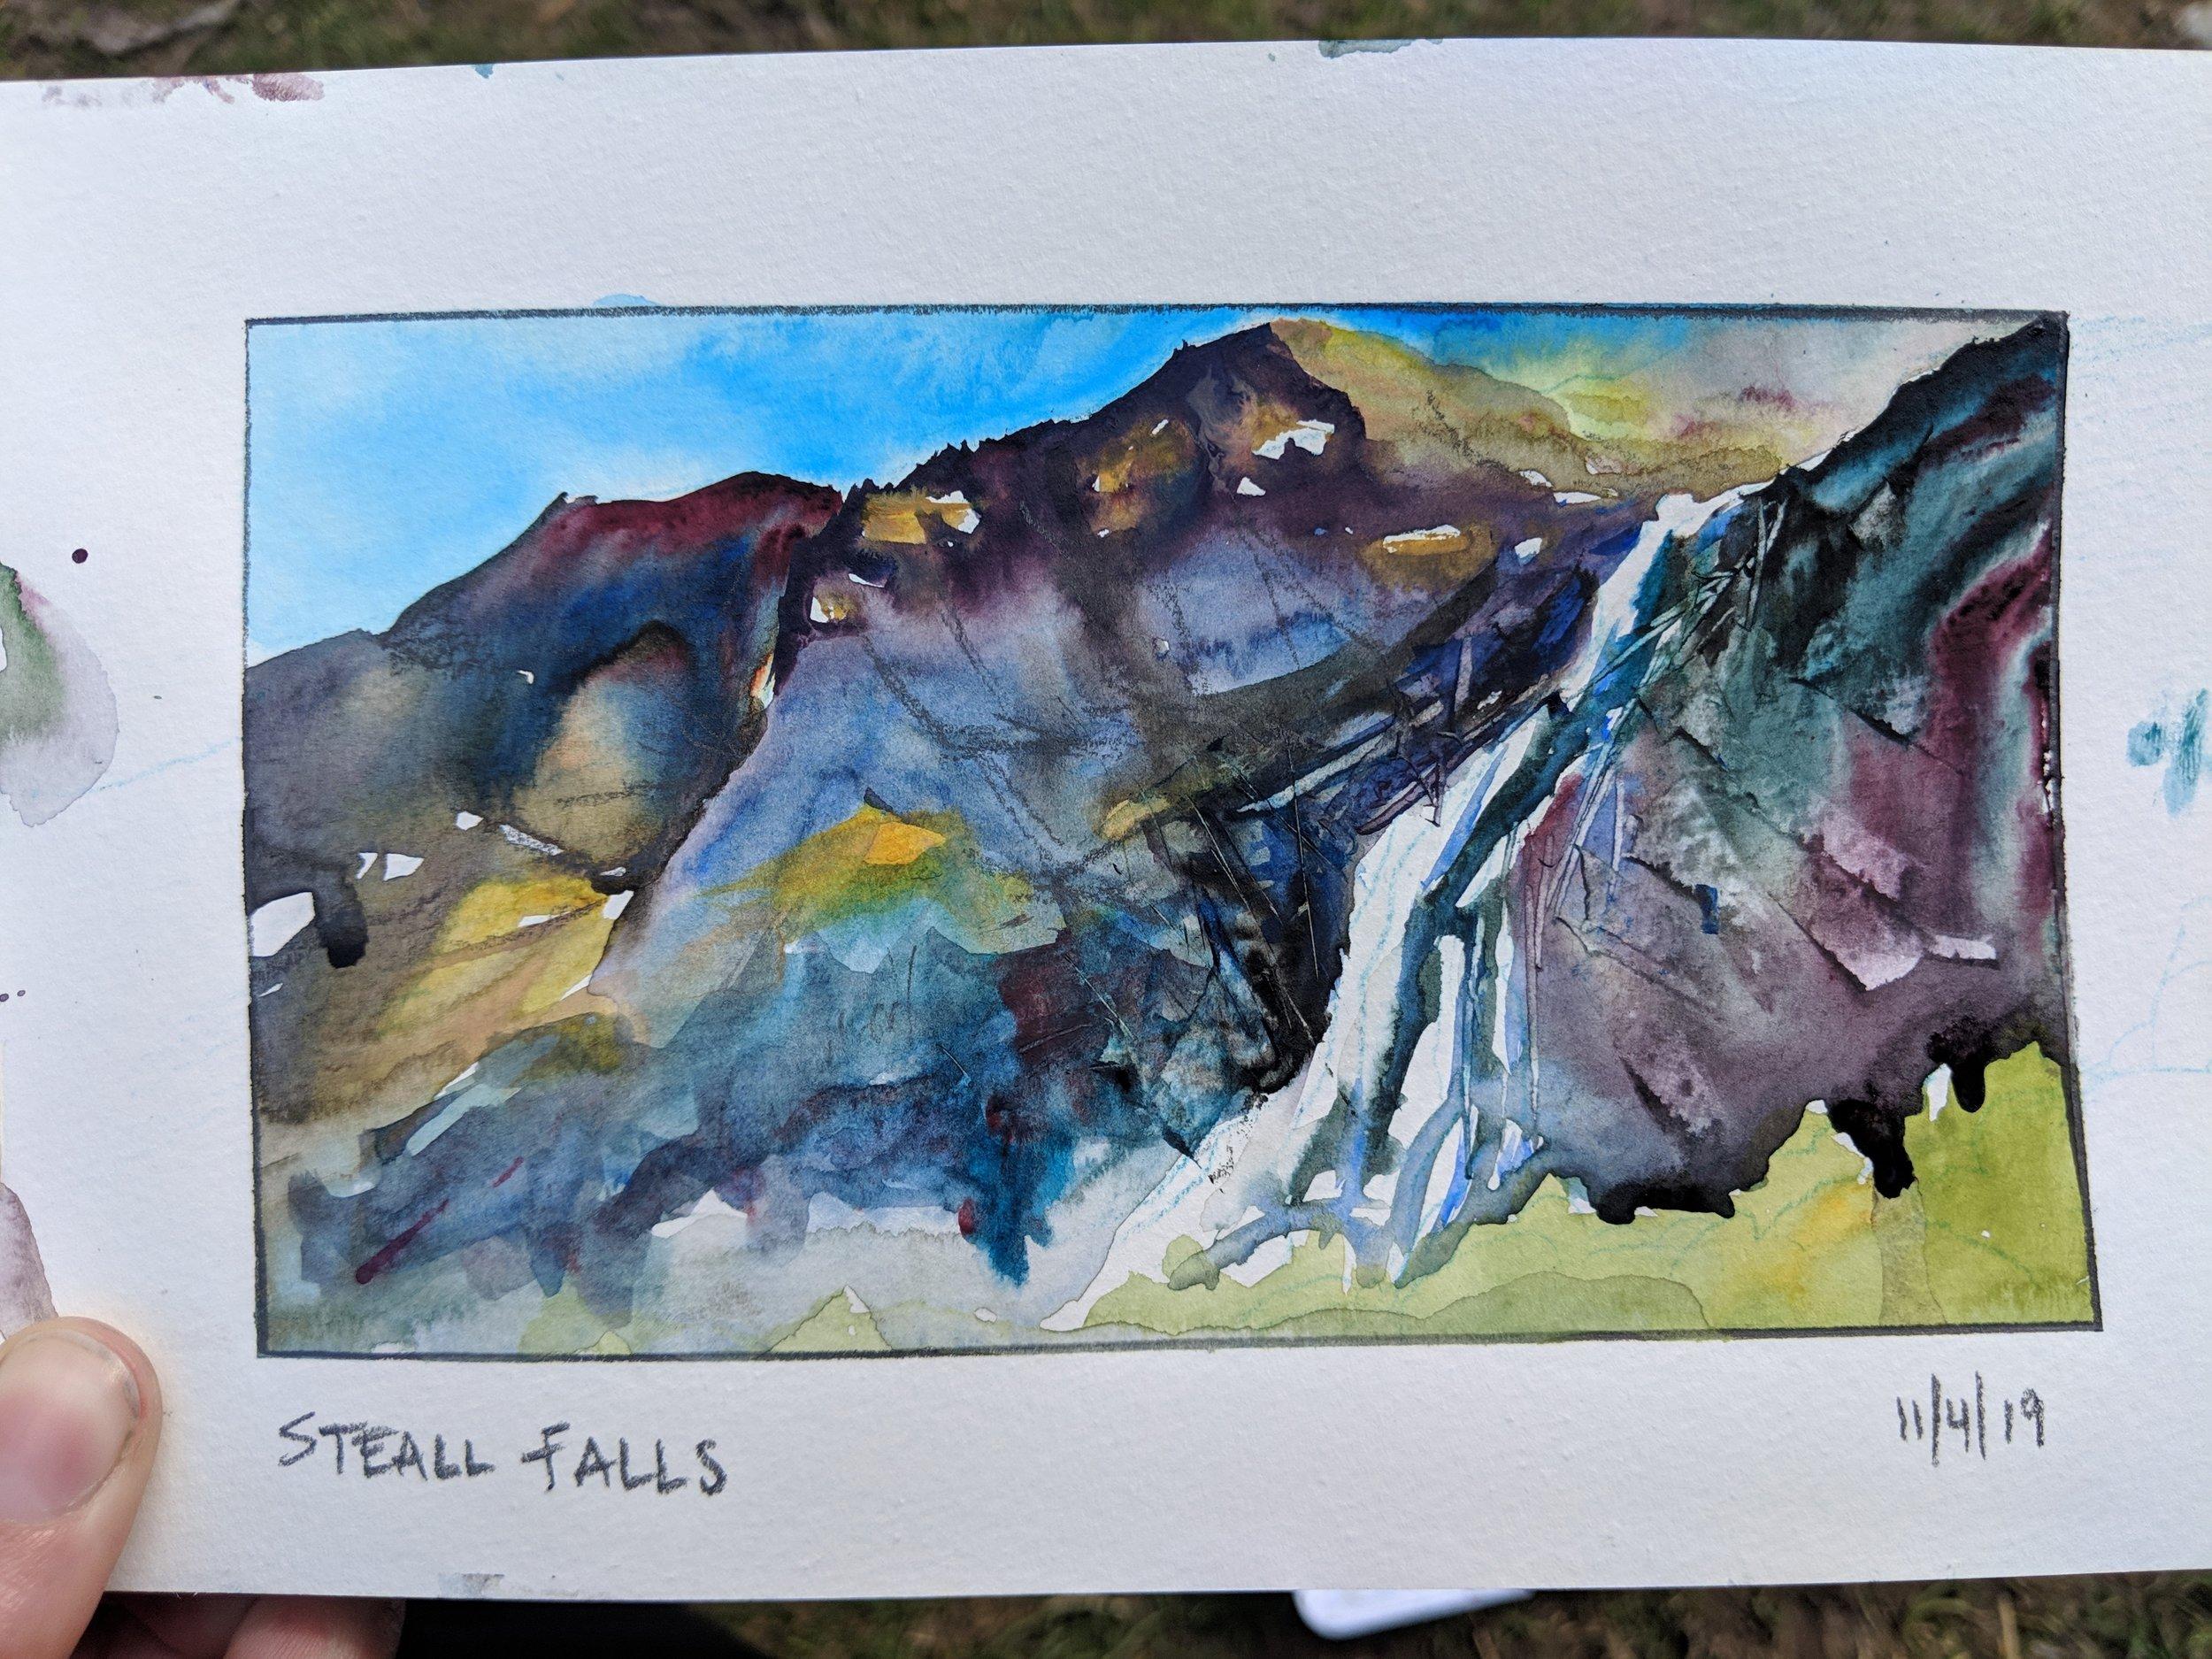 Steall Falls 10.jpg